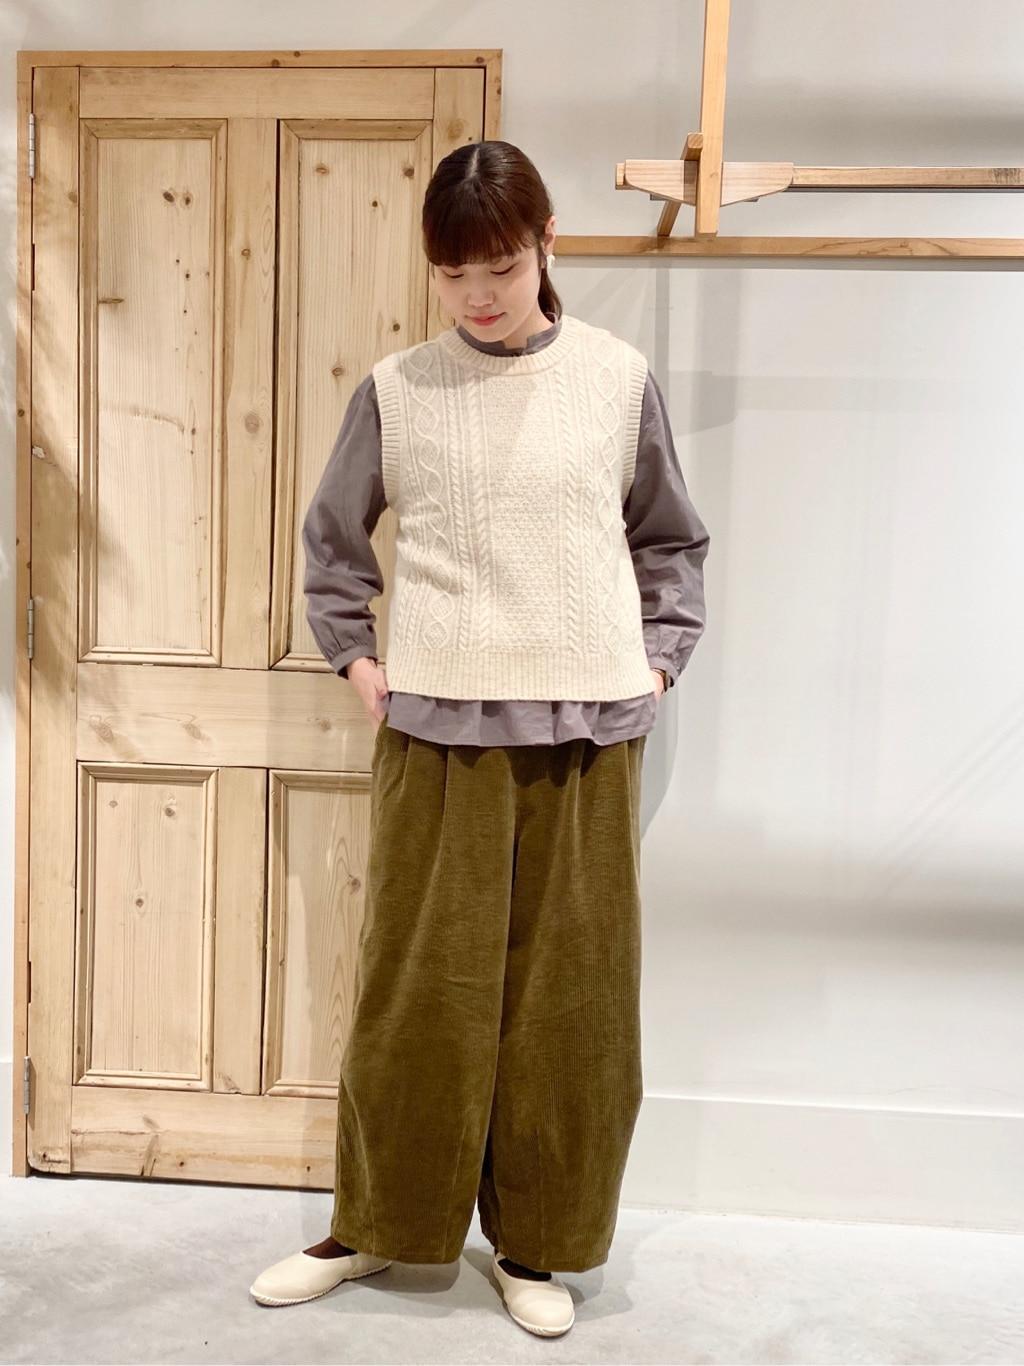 Malle chambre de charme 調布パルコ 身長:167cm 2020.10.01